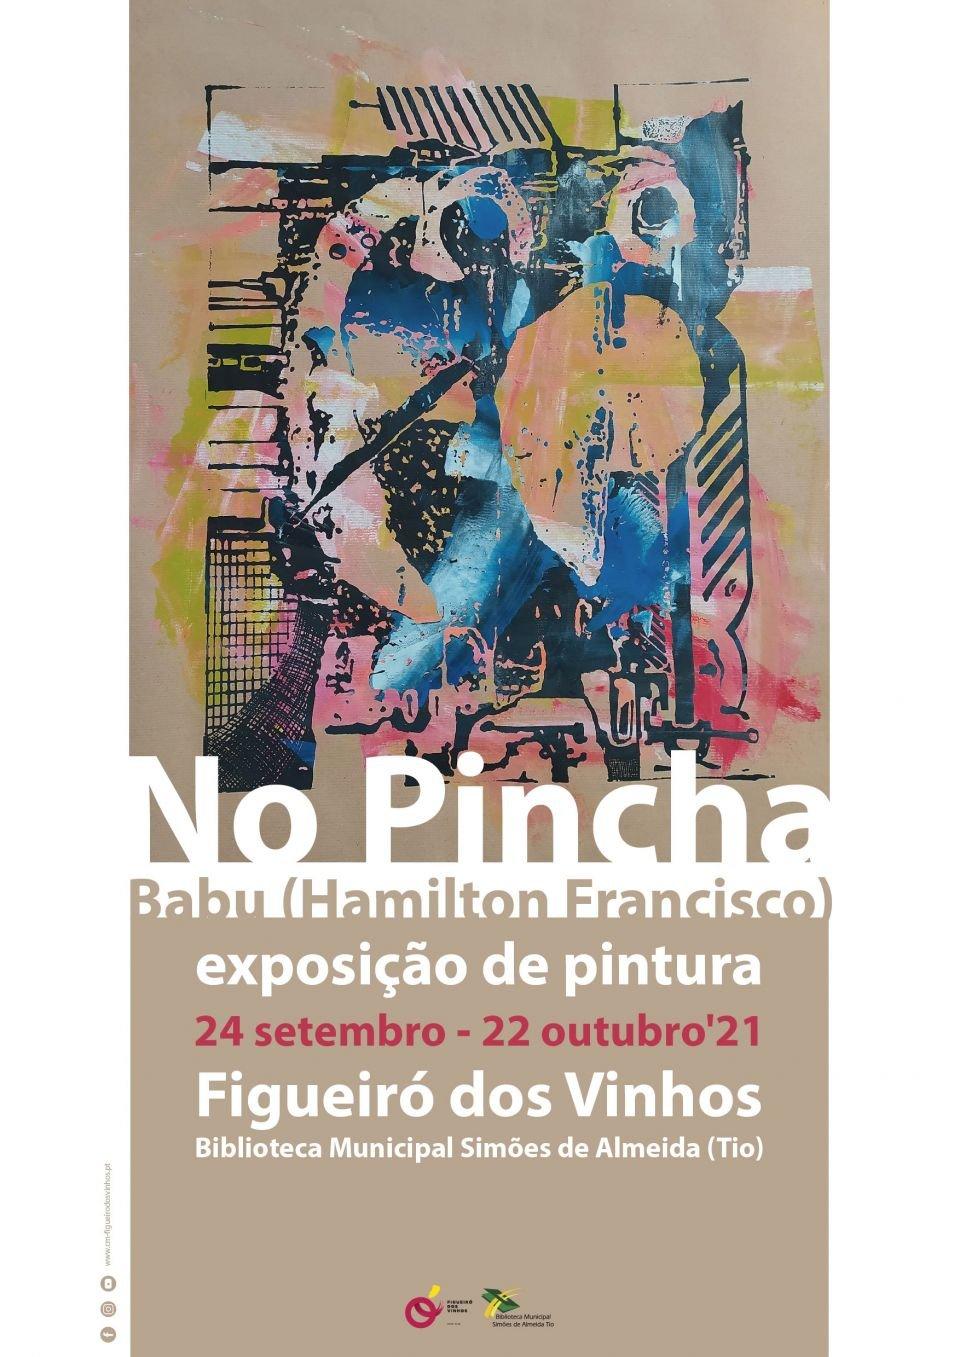 Exposição de Pintura 'No Pincha', de Babu (Hamilton Francisco)